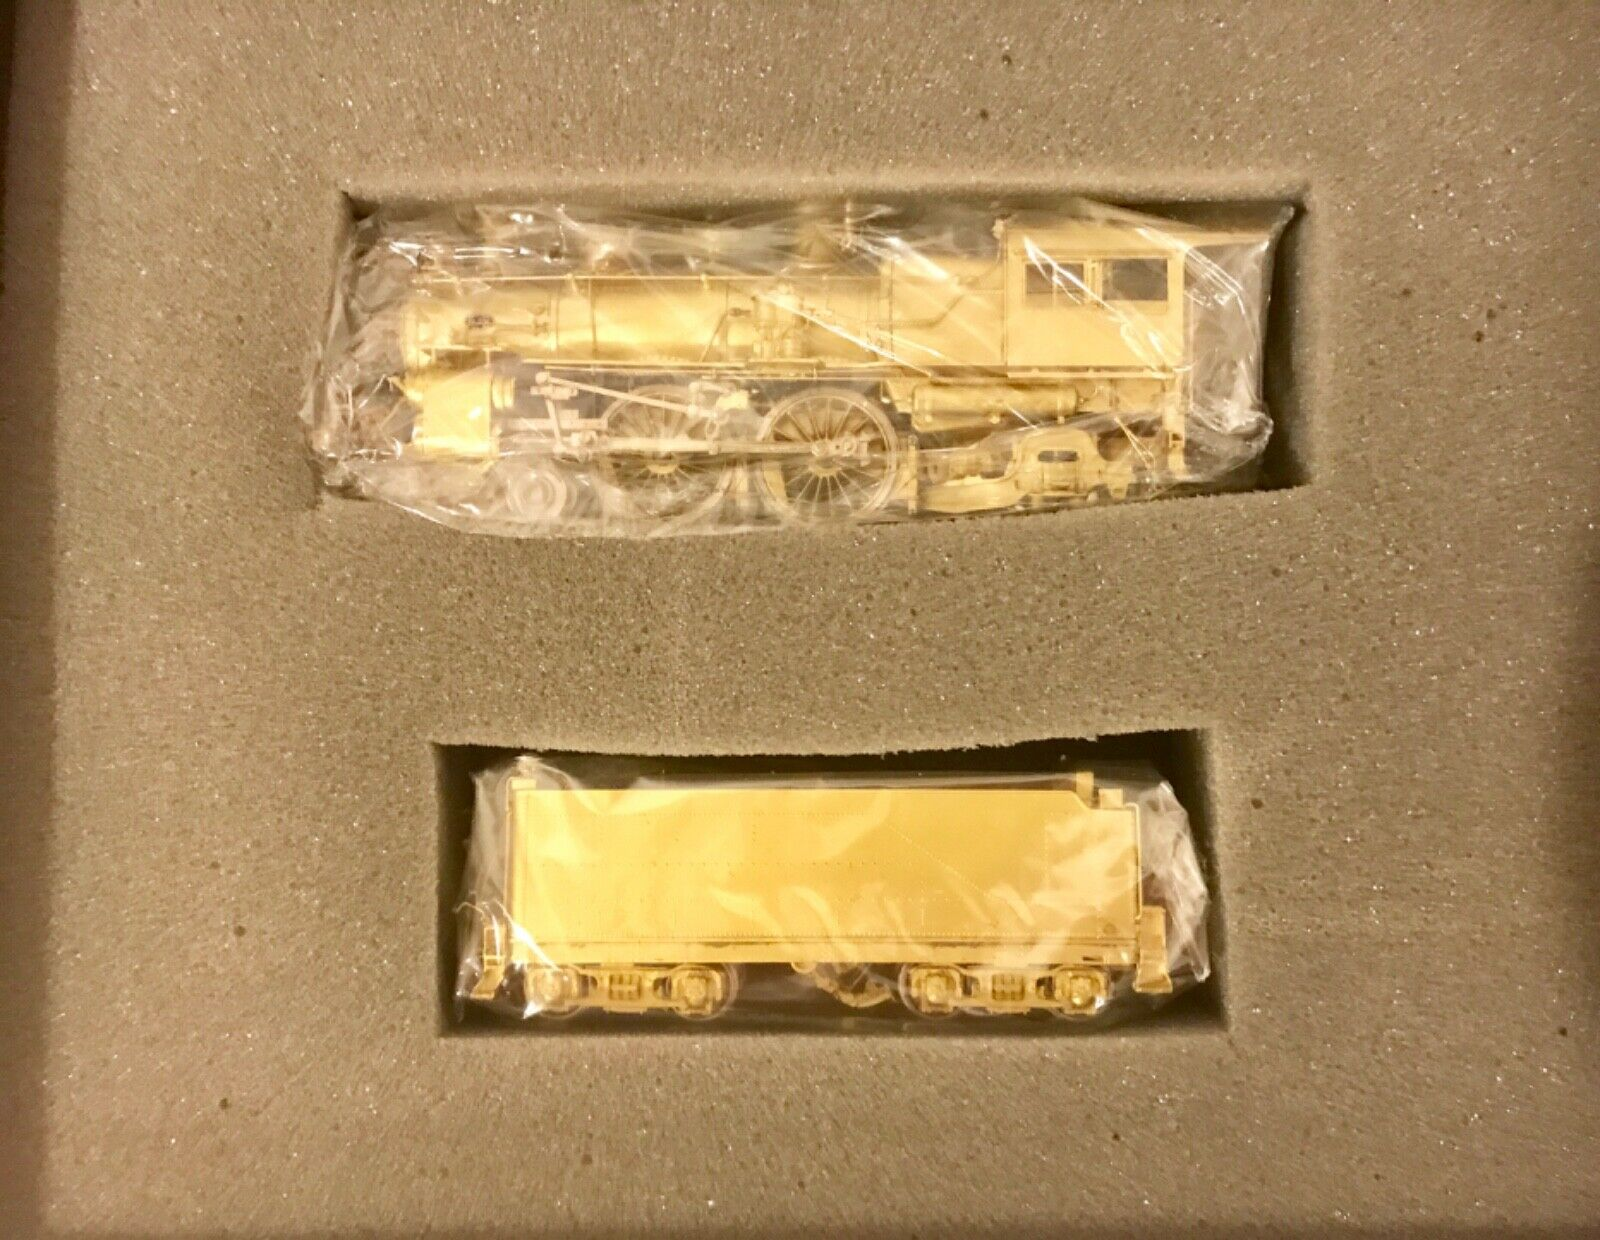 Key Imports HO Scale Brass PRR E-5S 4-4-2 Atlantic Locomotive & Tender NIB